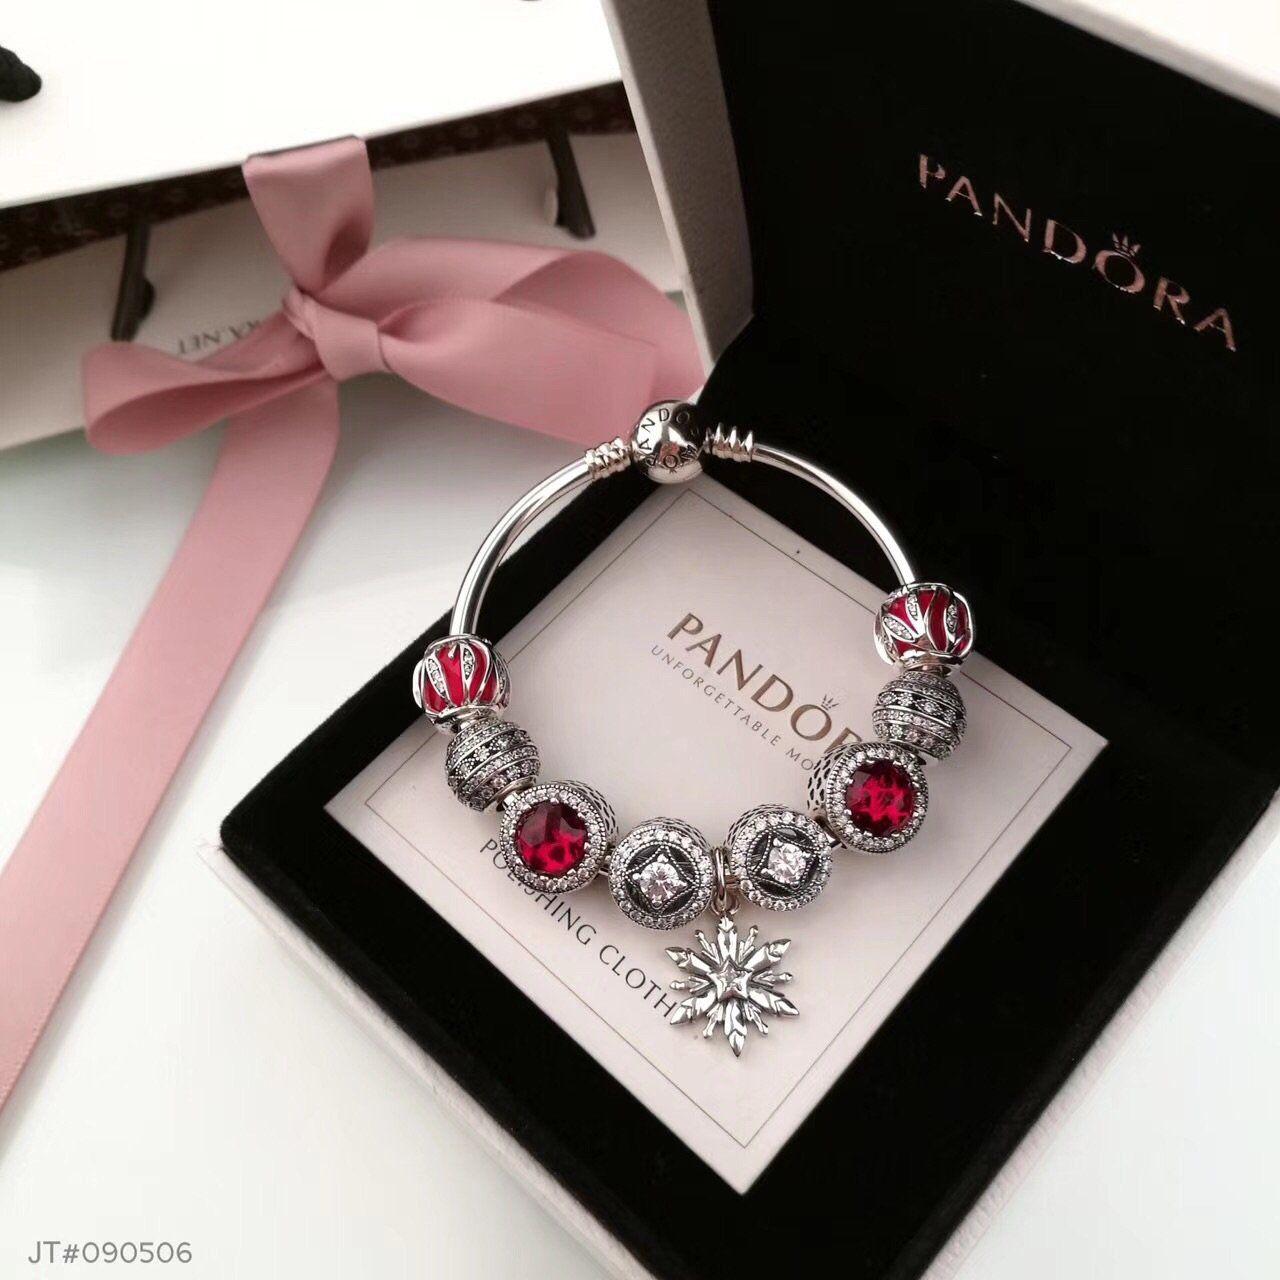 Pandora Red Bracelet With 9 Pcs Charms